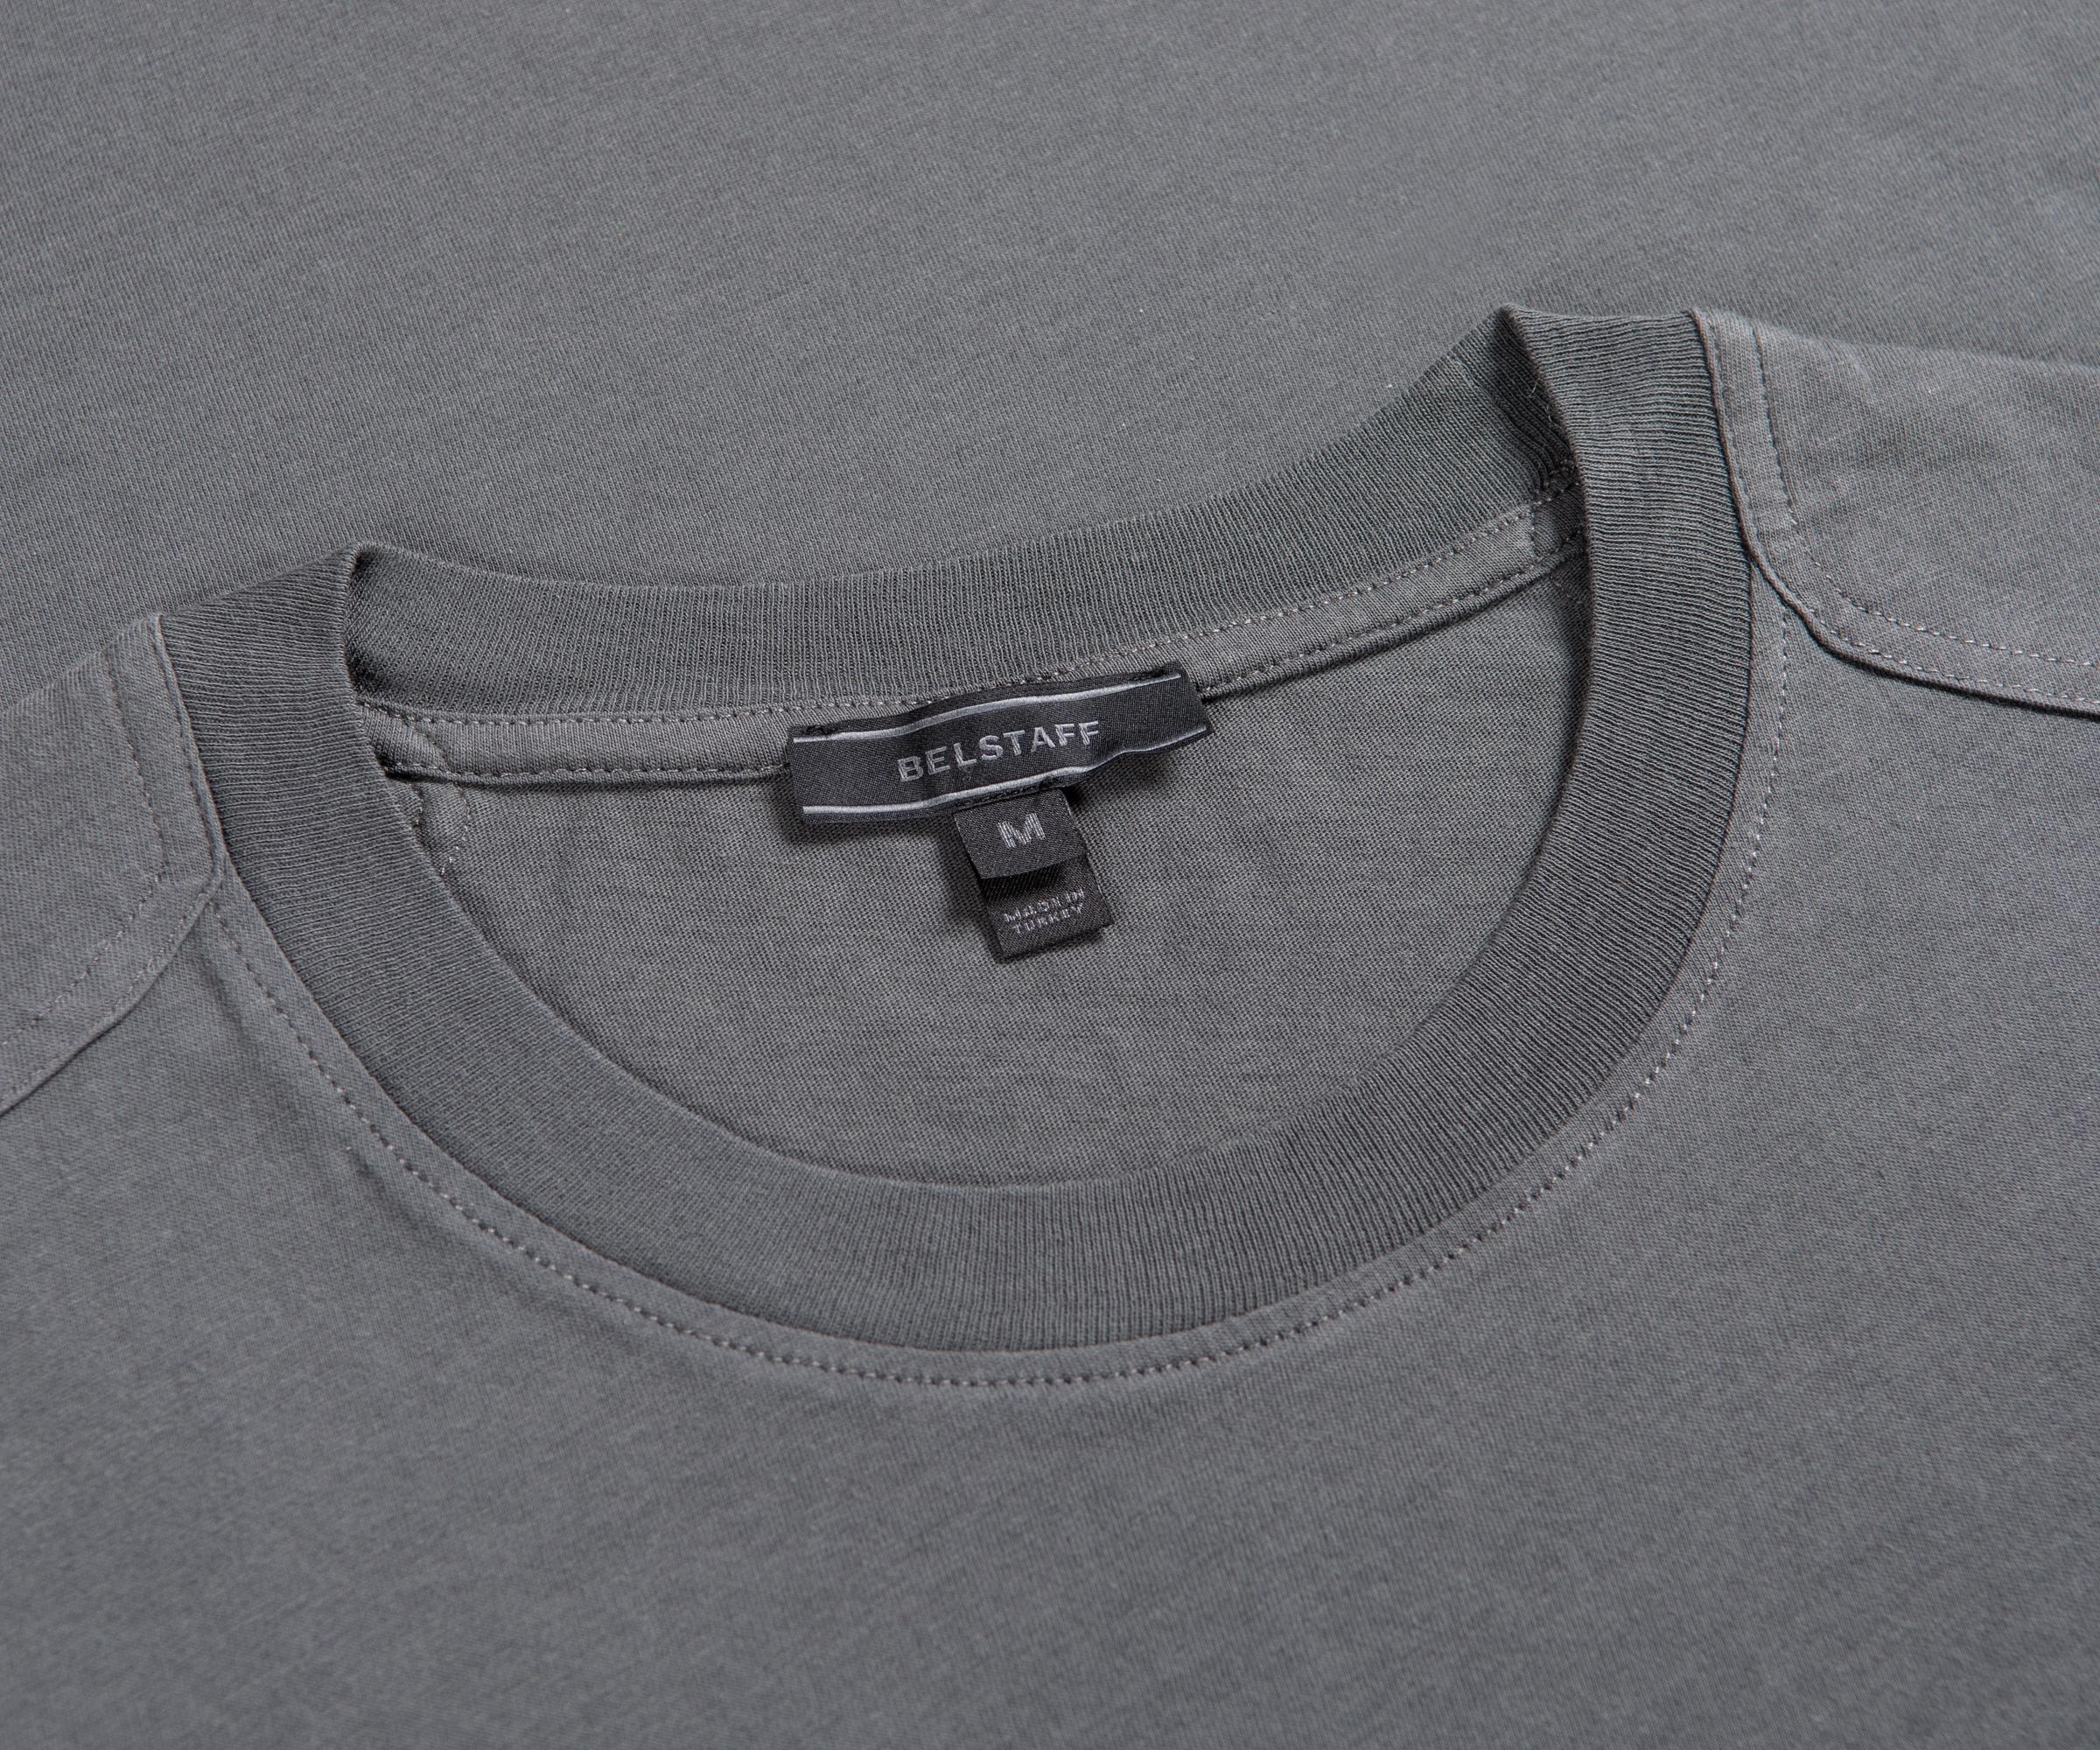 BELSTAFF /'THOM/' CHEST POCKET CLASSIC T-SHIRT DARK LIGHT BLUE CREW NECK